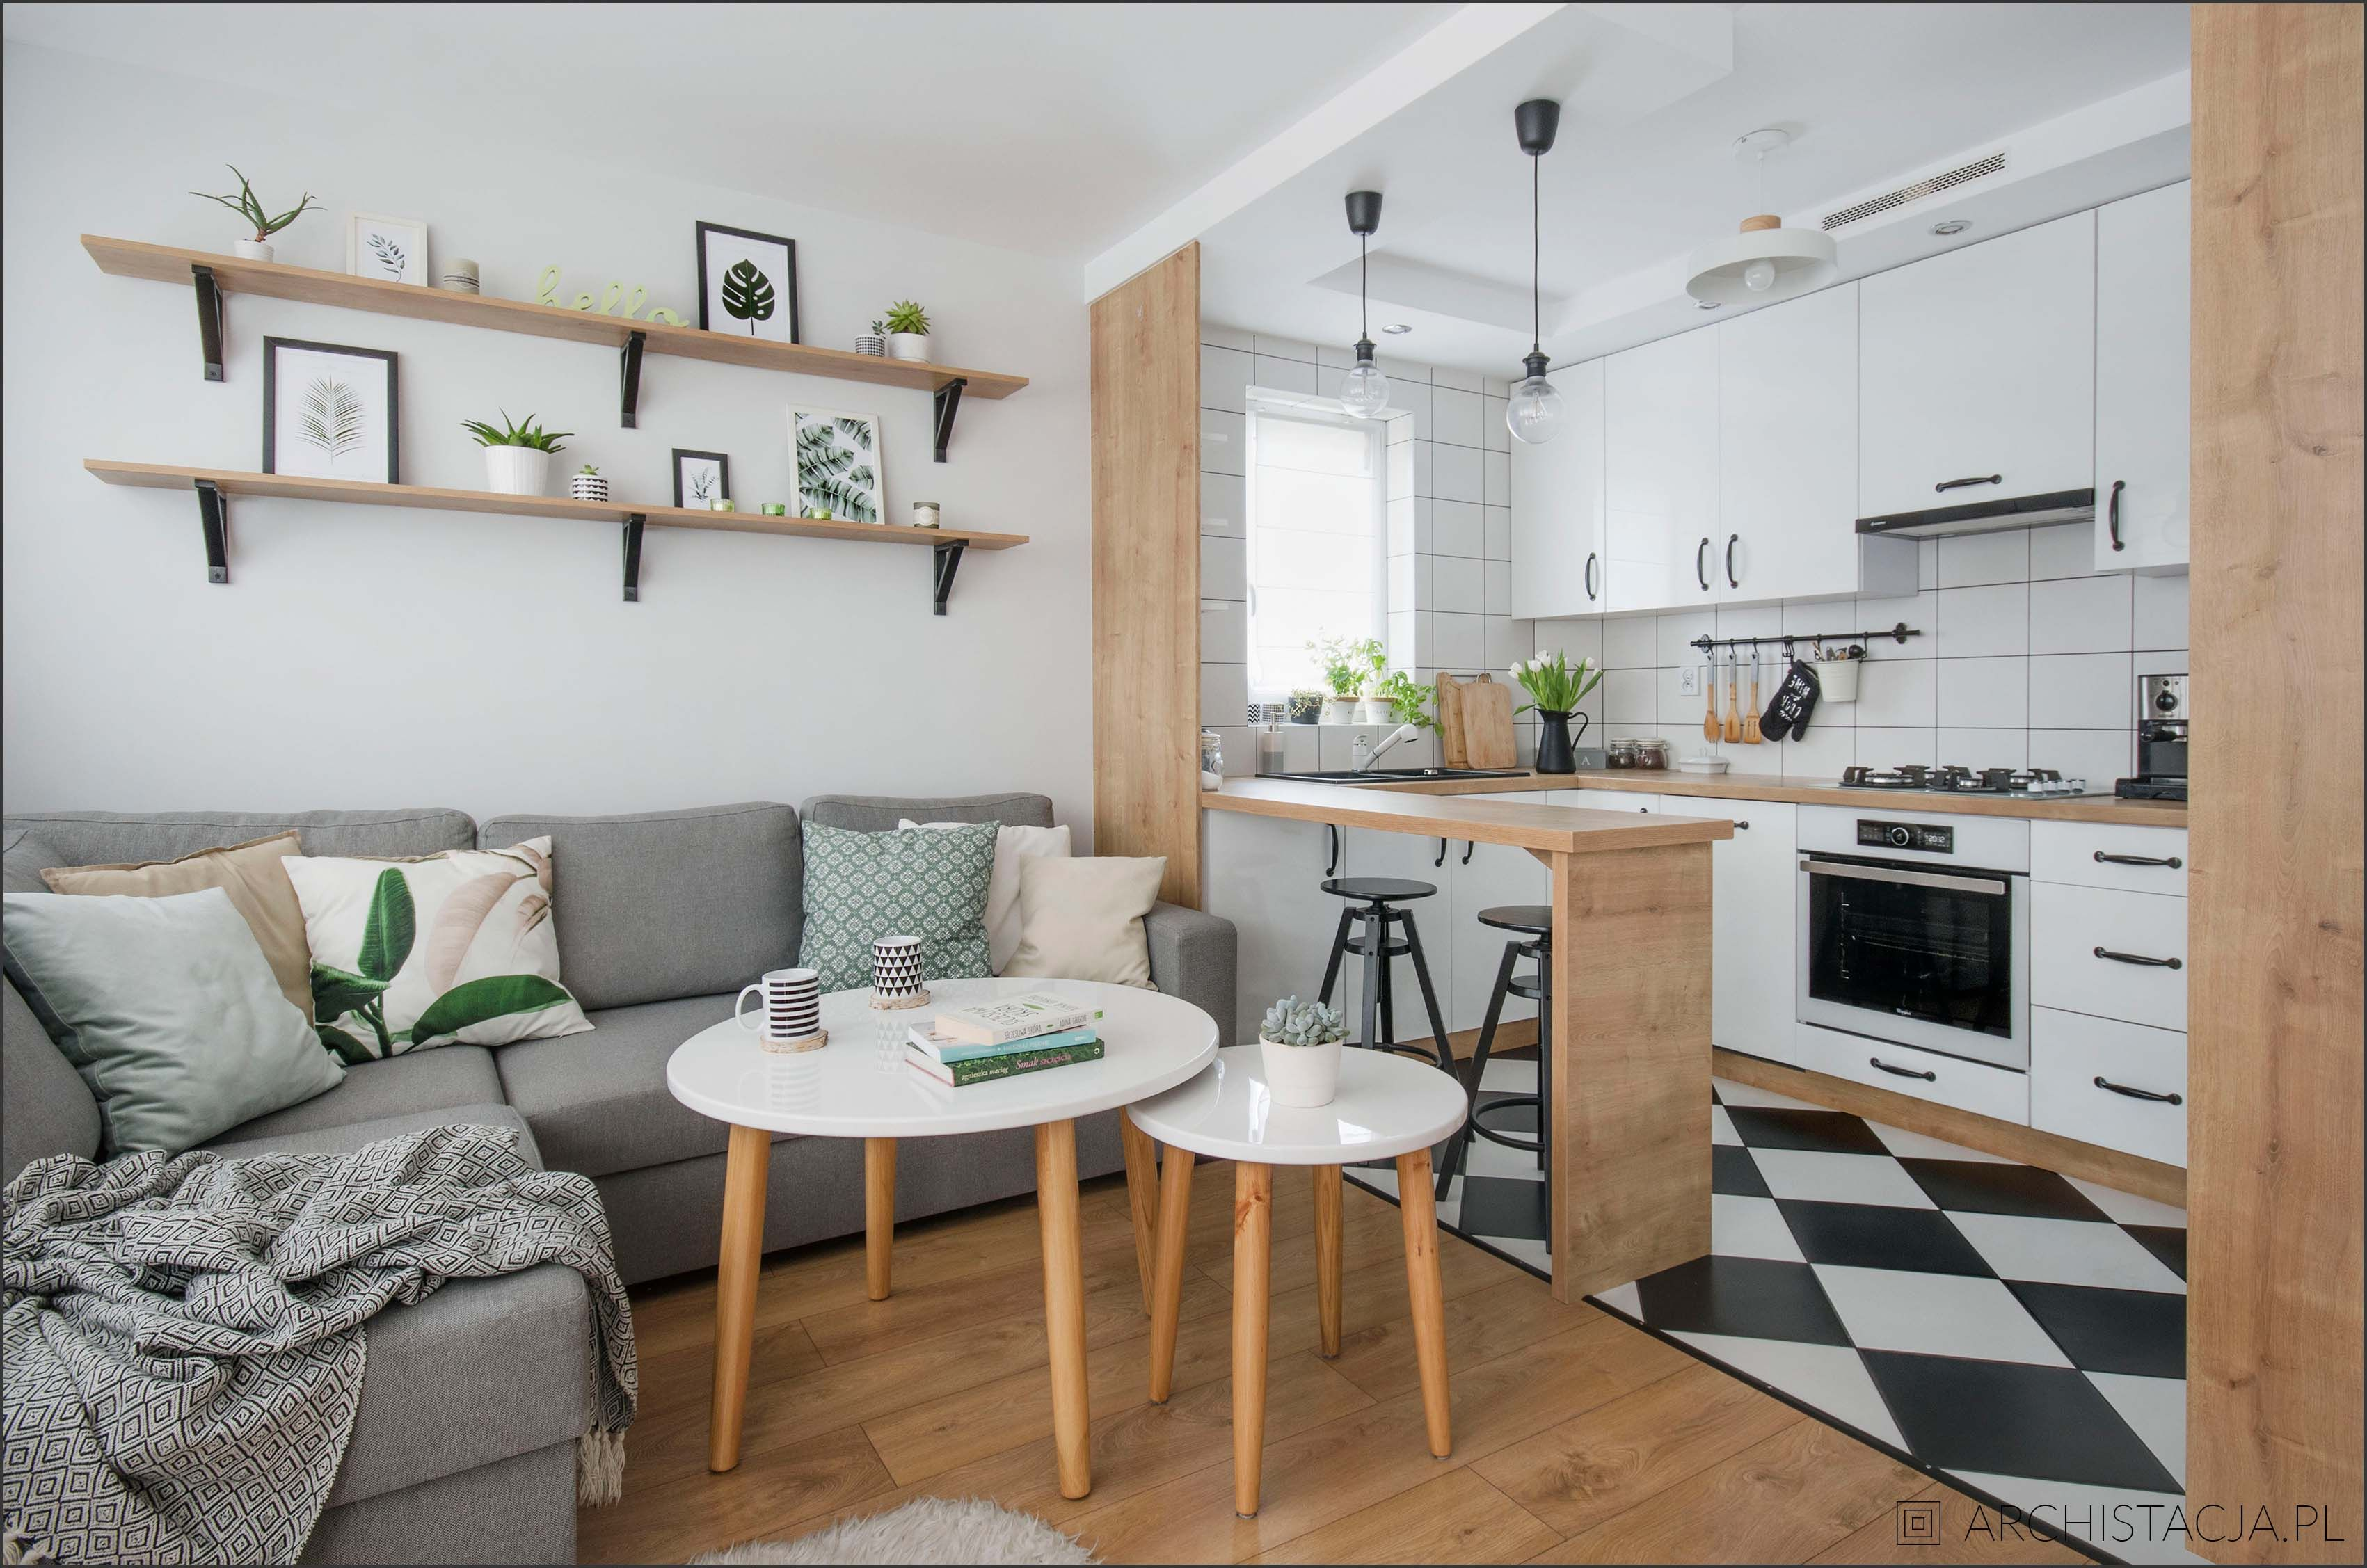 Znalezione Obrazy Dla Zapytania Salon Z Kuchnia W Bloku Living Room Kitchen Kitchen Inspirations Sweet Home